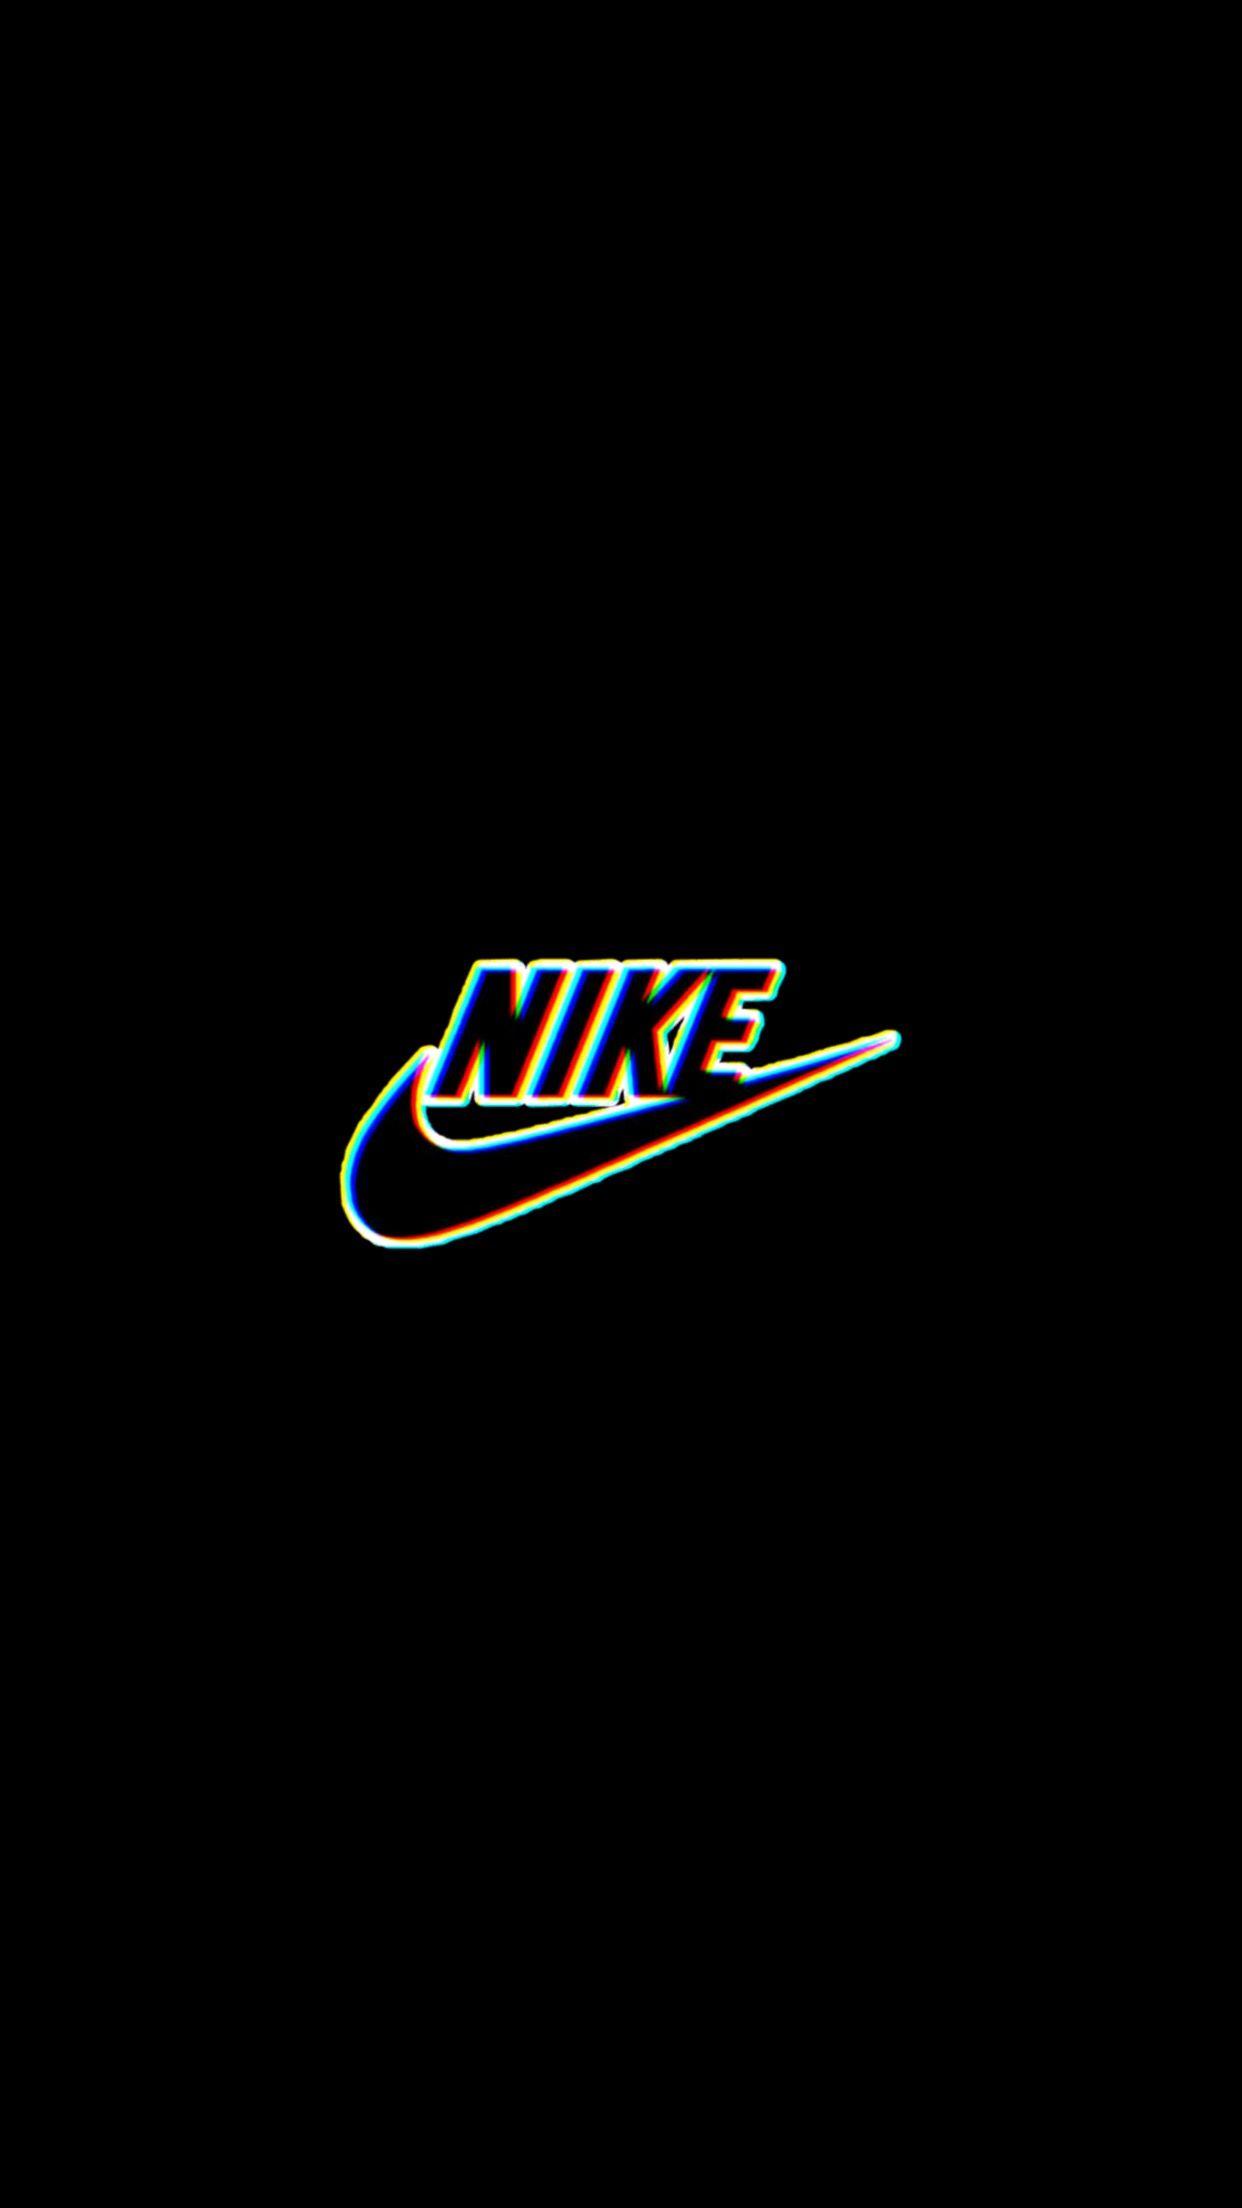 Nike background, aesthetic wallpaper, aesthetic background ...